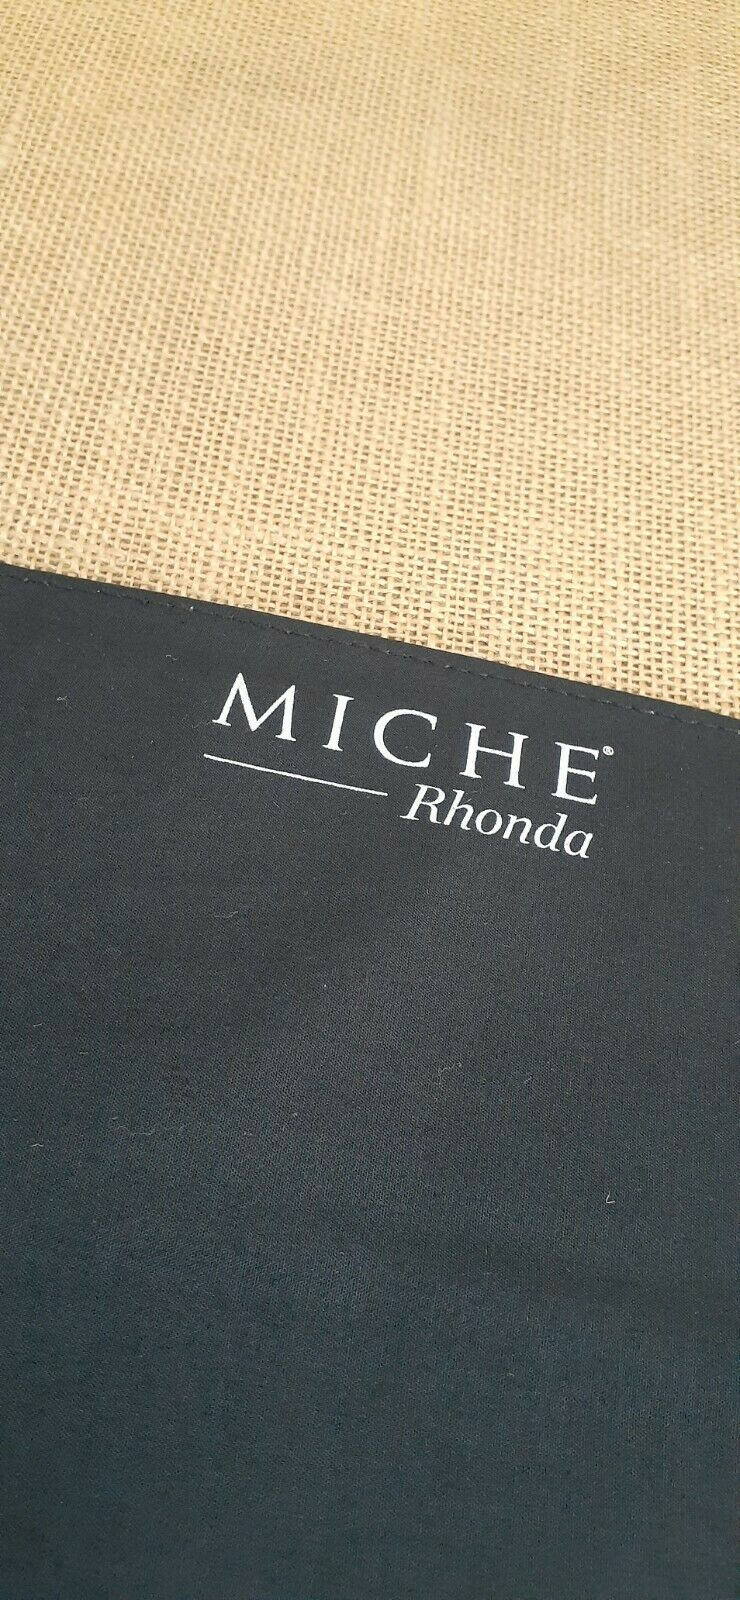 Miche Classic Shell Rhonda Free Shipping - image 4